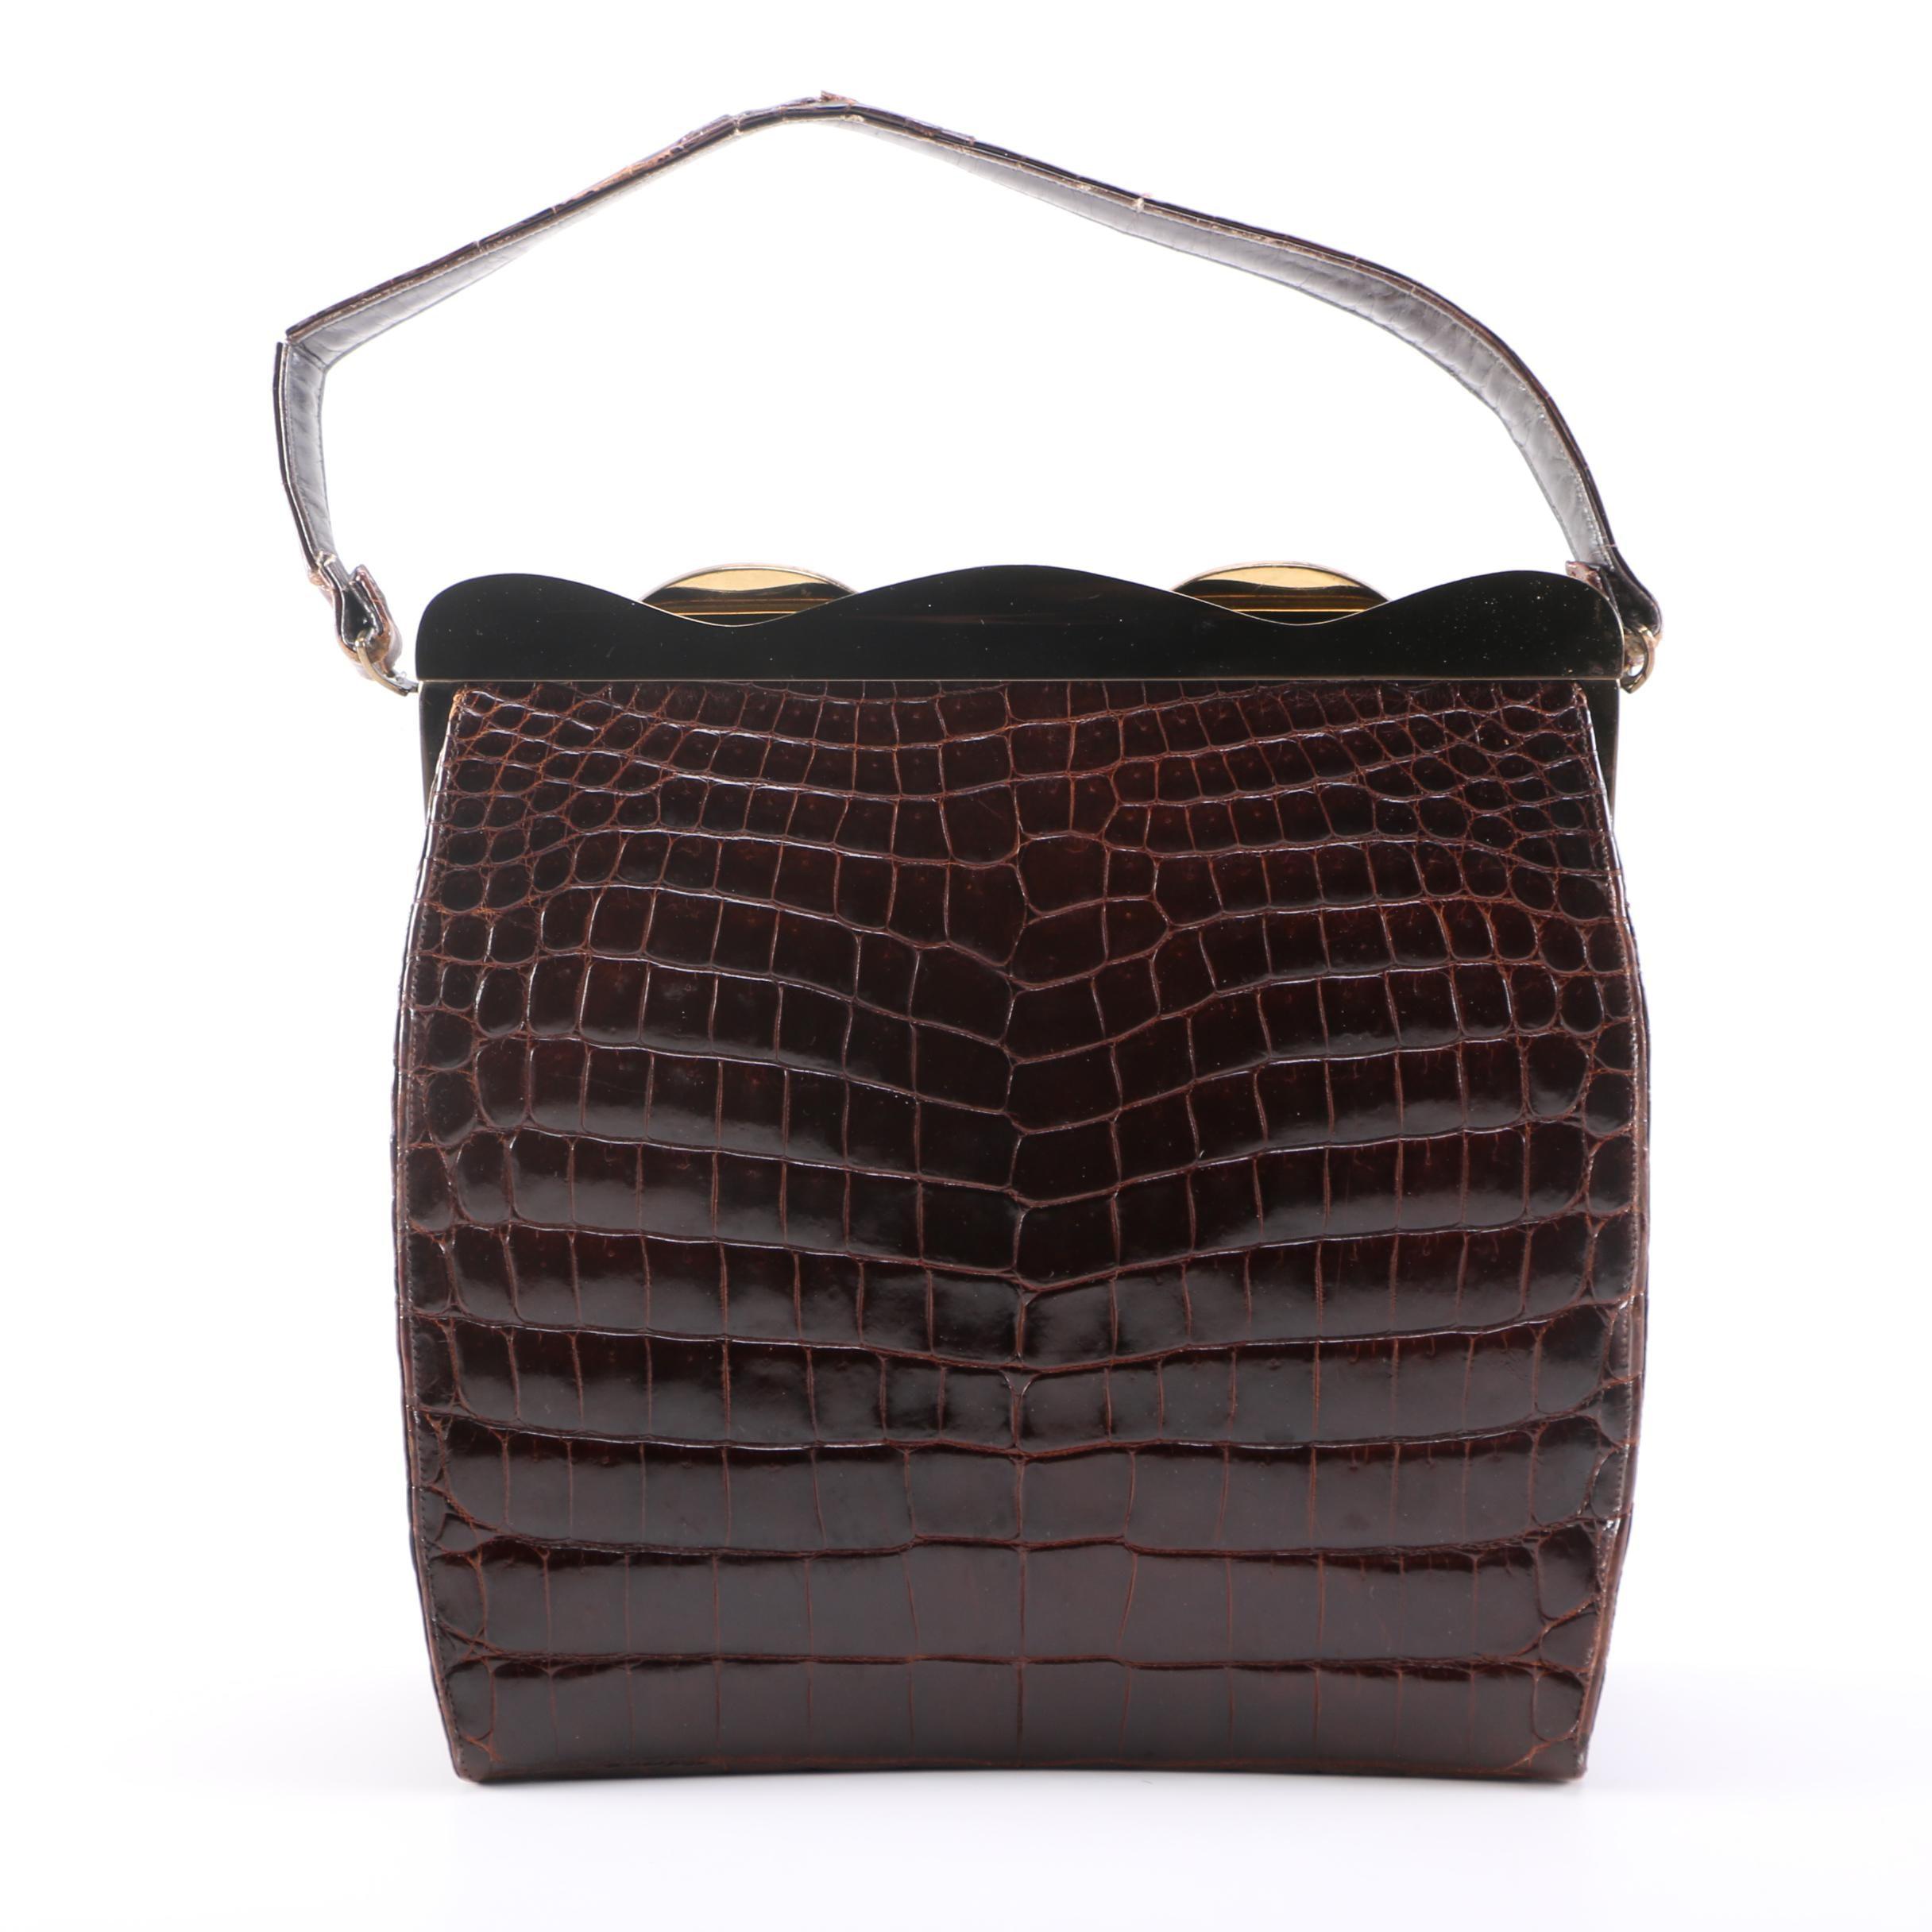 Vintage Rosenfeld Alligator Bag with Coin Purse